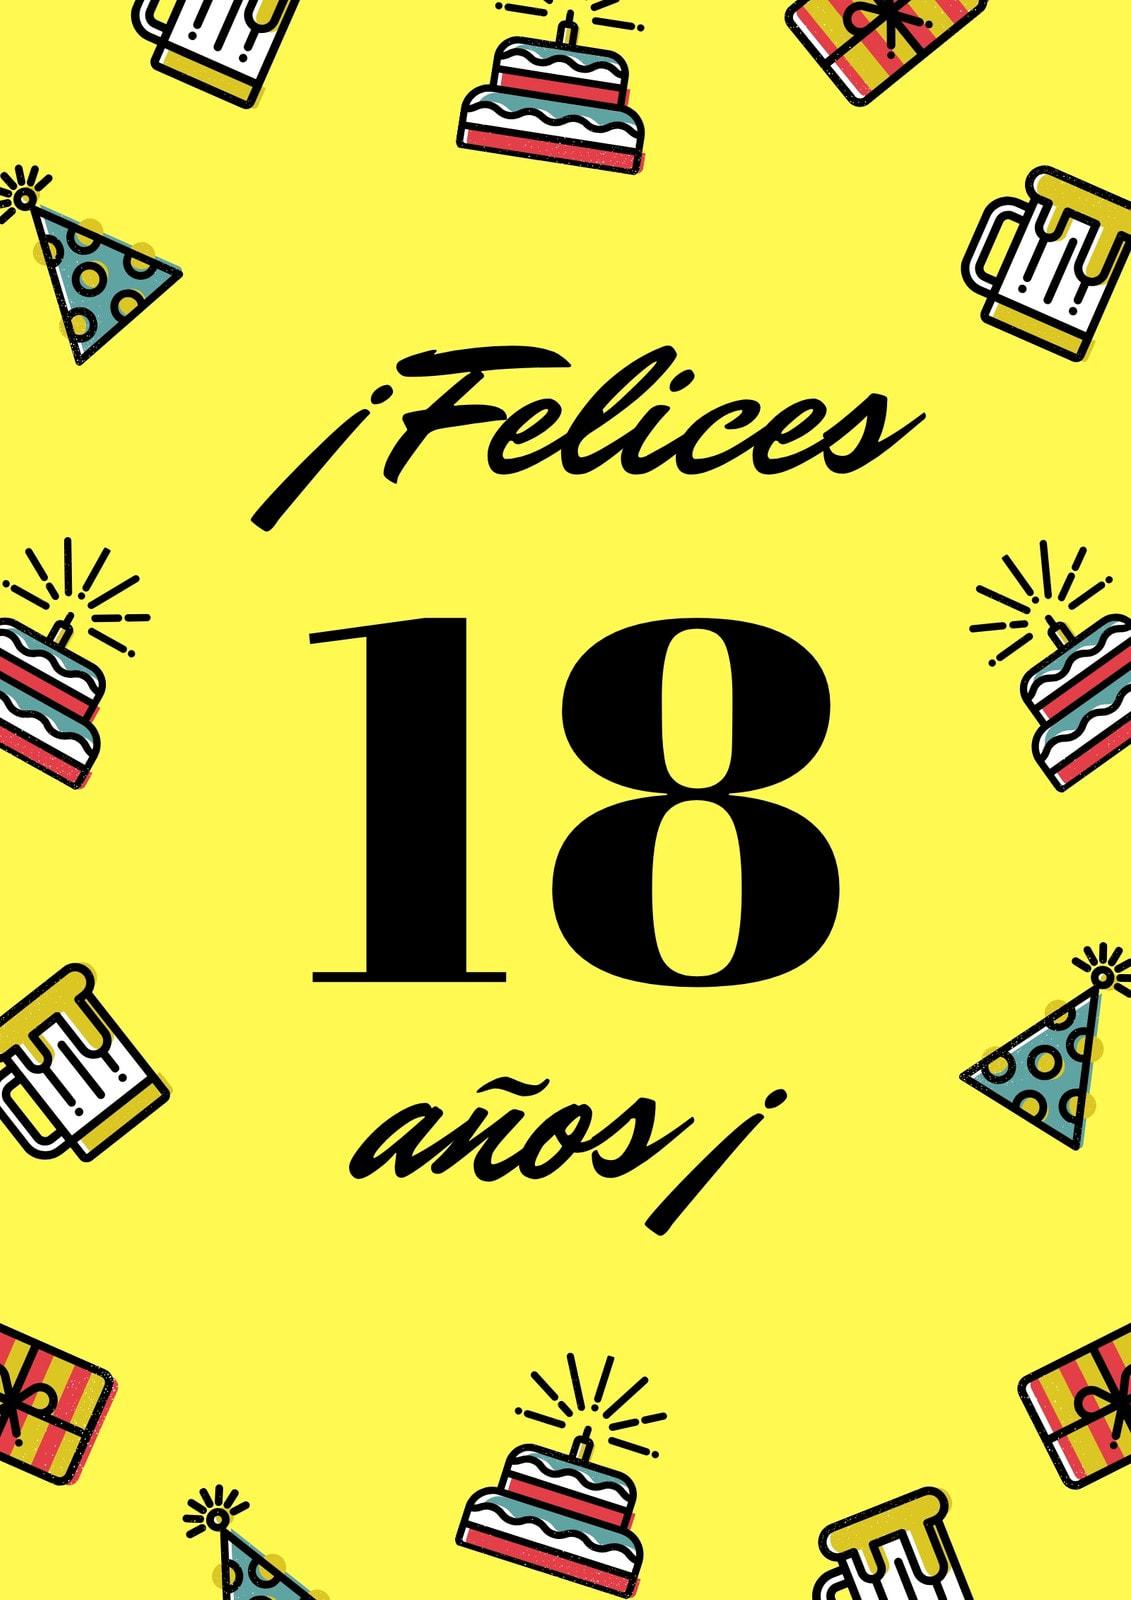 Amarillo Fiesta Elementos 21.° Cumpleaños Póster